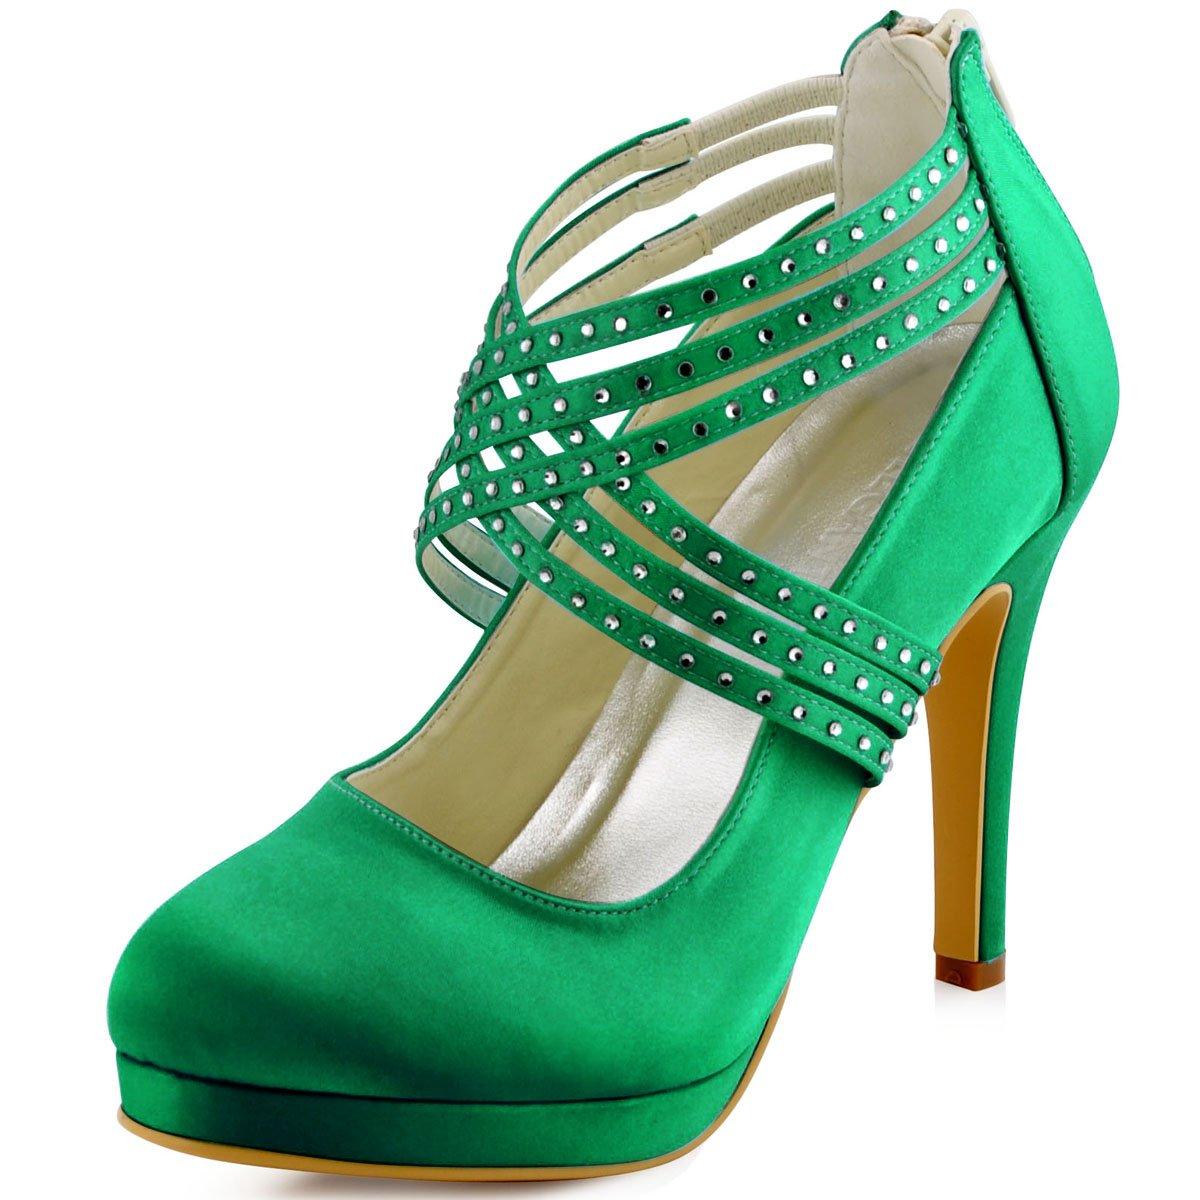 ElegantPark Women High Heel Pumps Closed Toe Platform Strappy Satin Evening Prom Dress Wedding Shoes B011B26WXE 10 B(M) US|Green